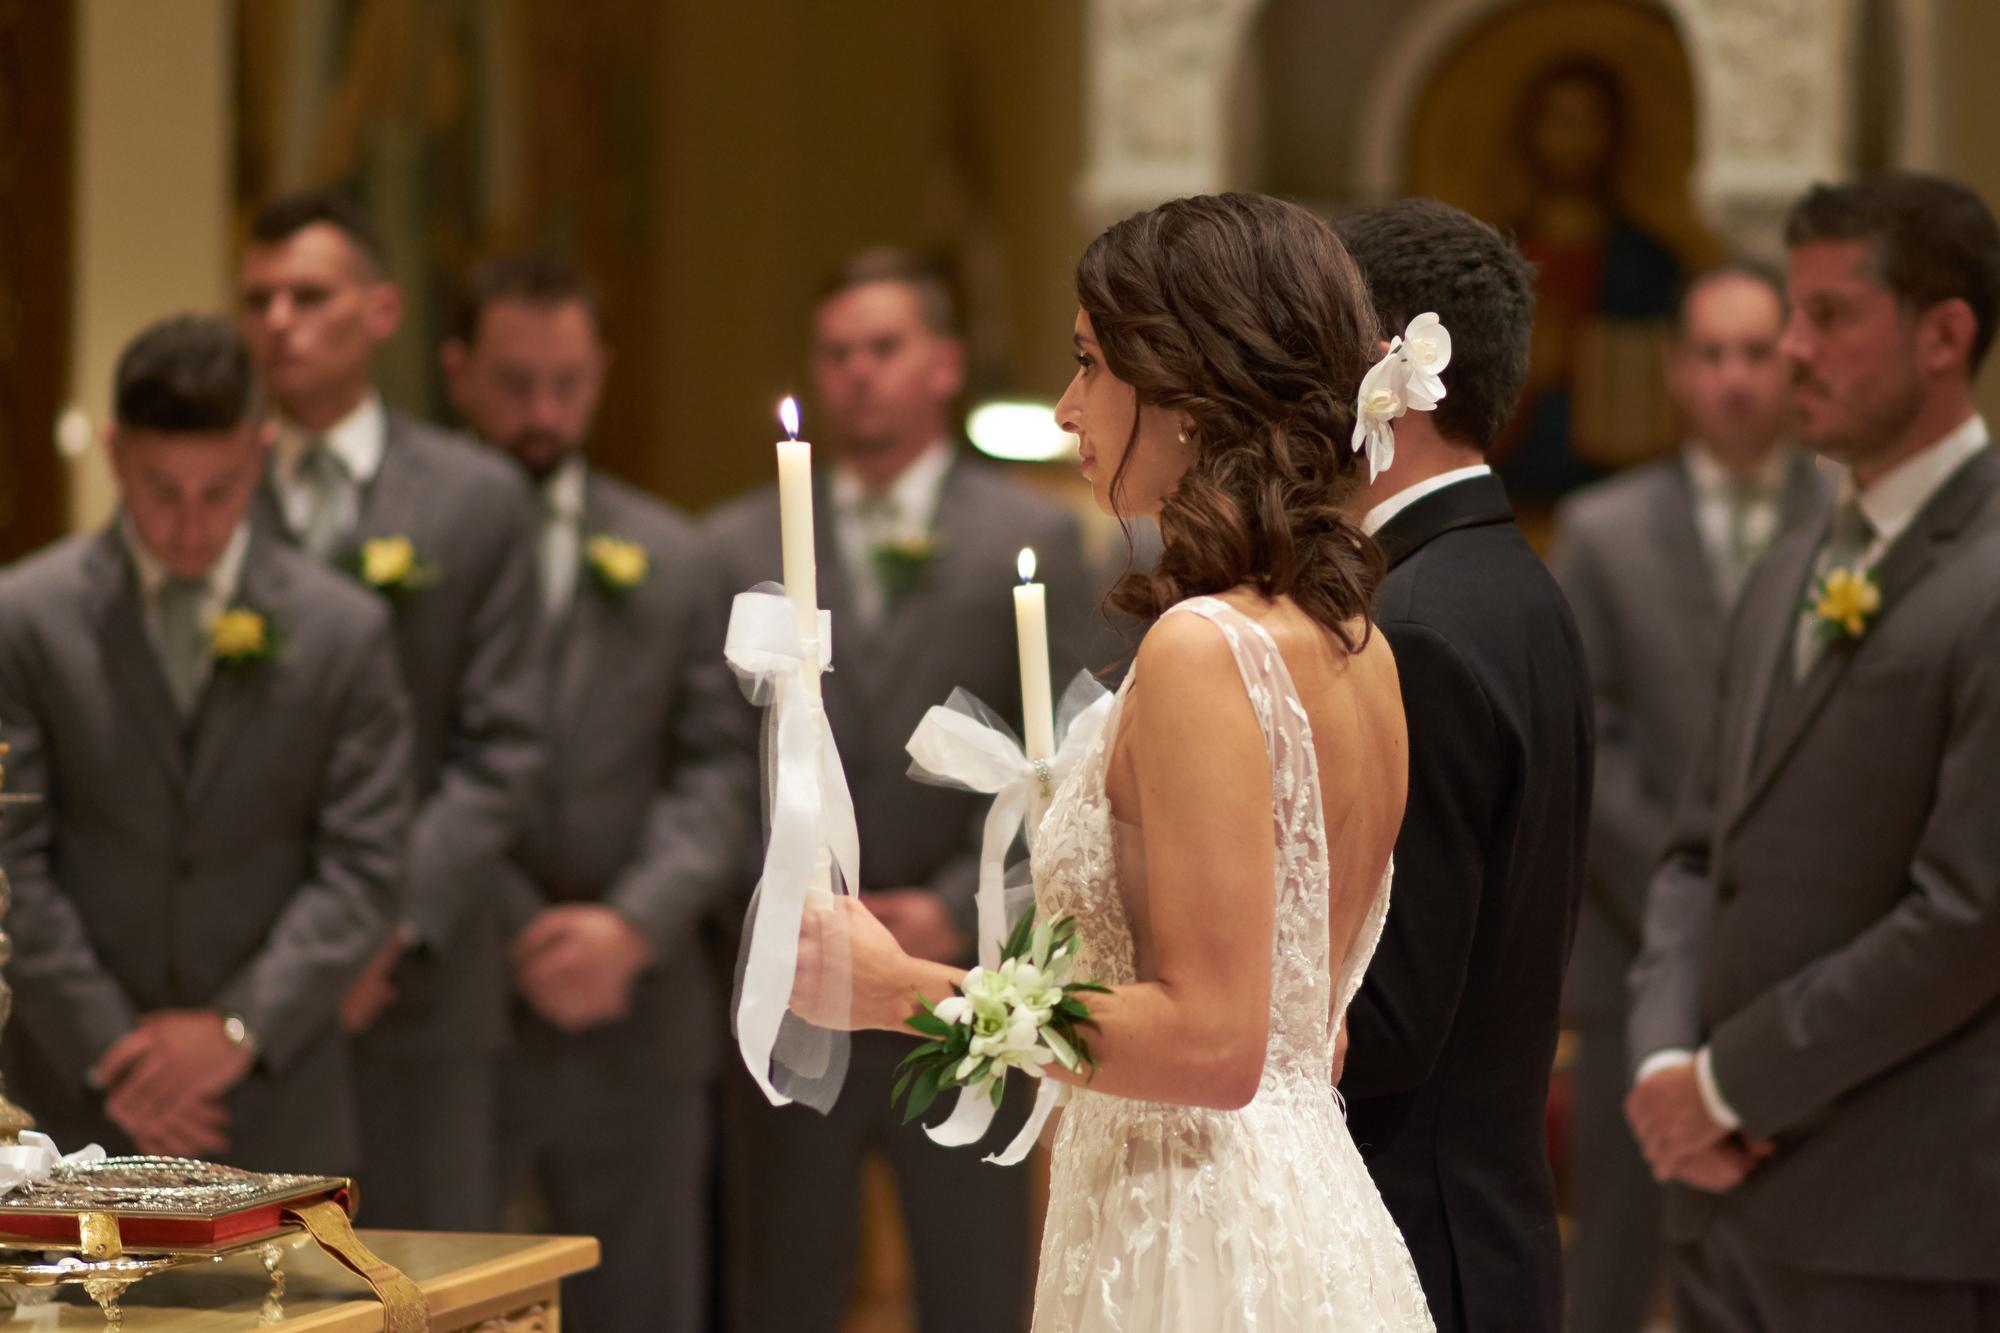 2019-07-20_15-56-32_FUJIFILM_X-T1_(c)_RH_weddingsbyryanandkate.com.JPG